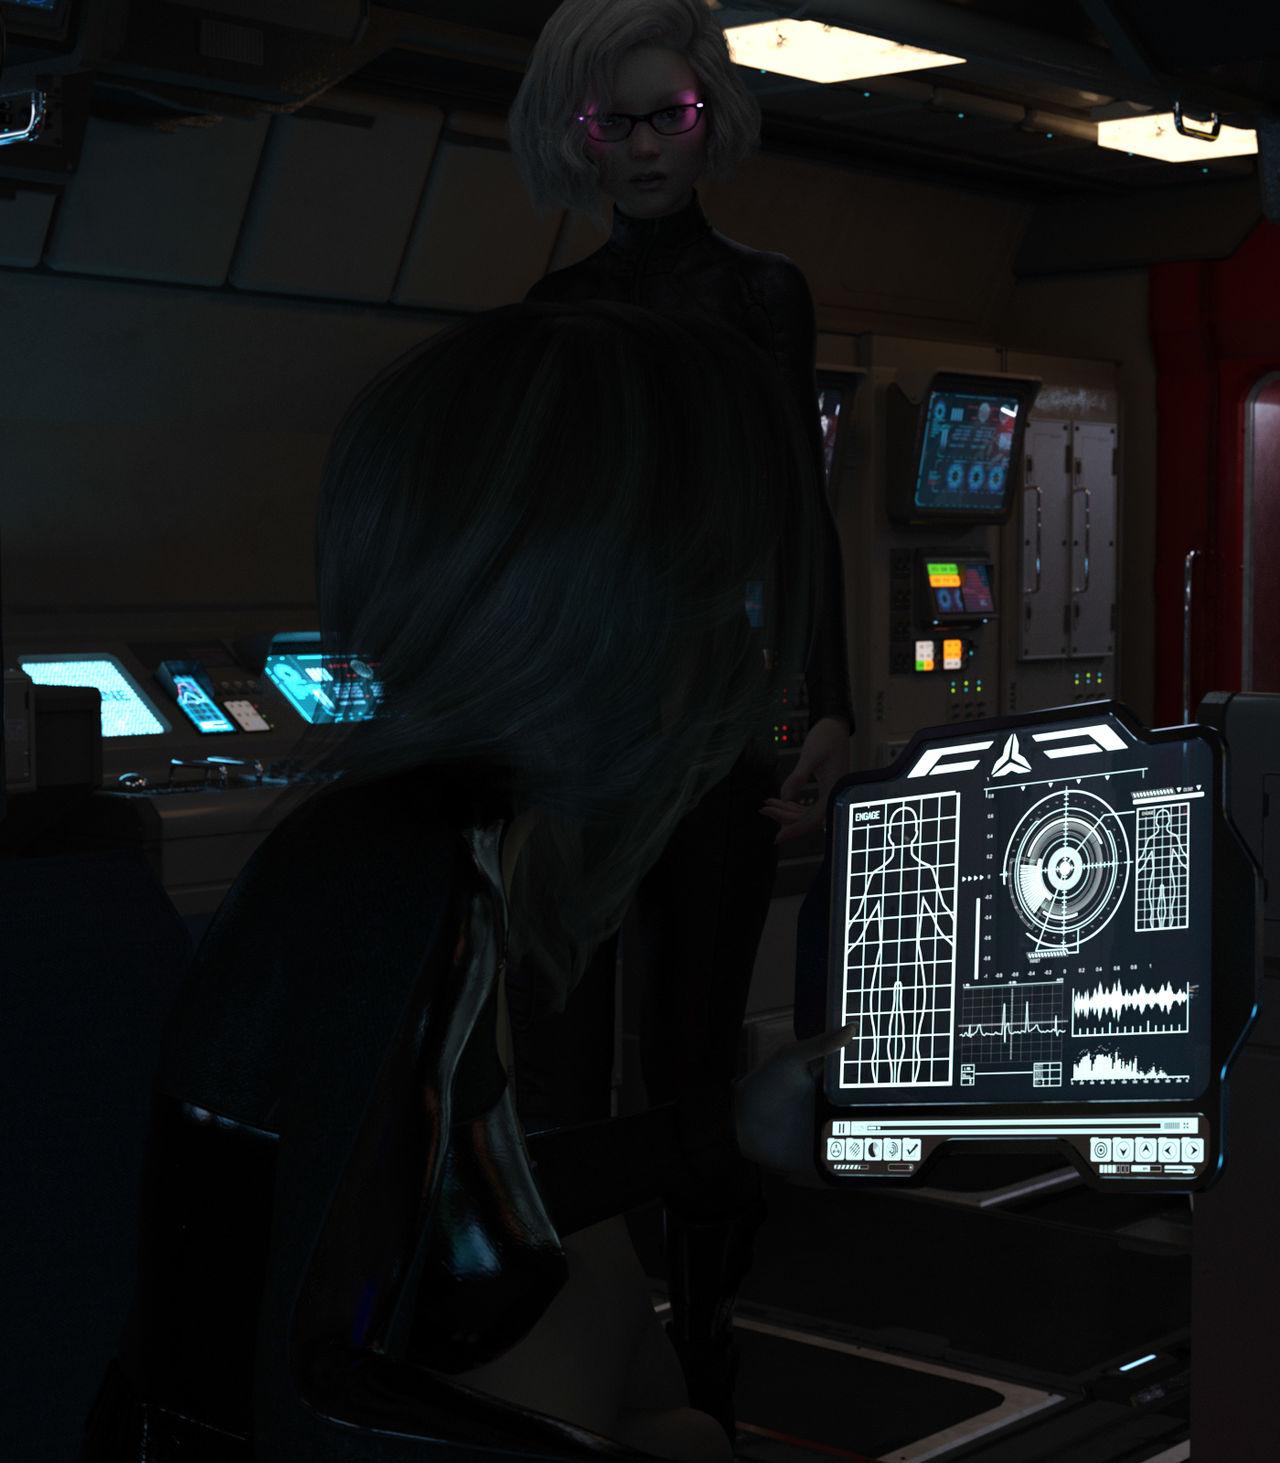 Hình ảnh 002 in Captain Anger